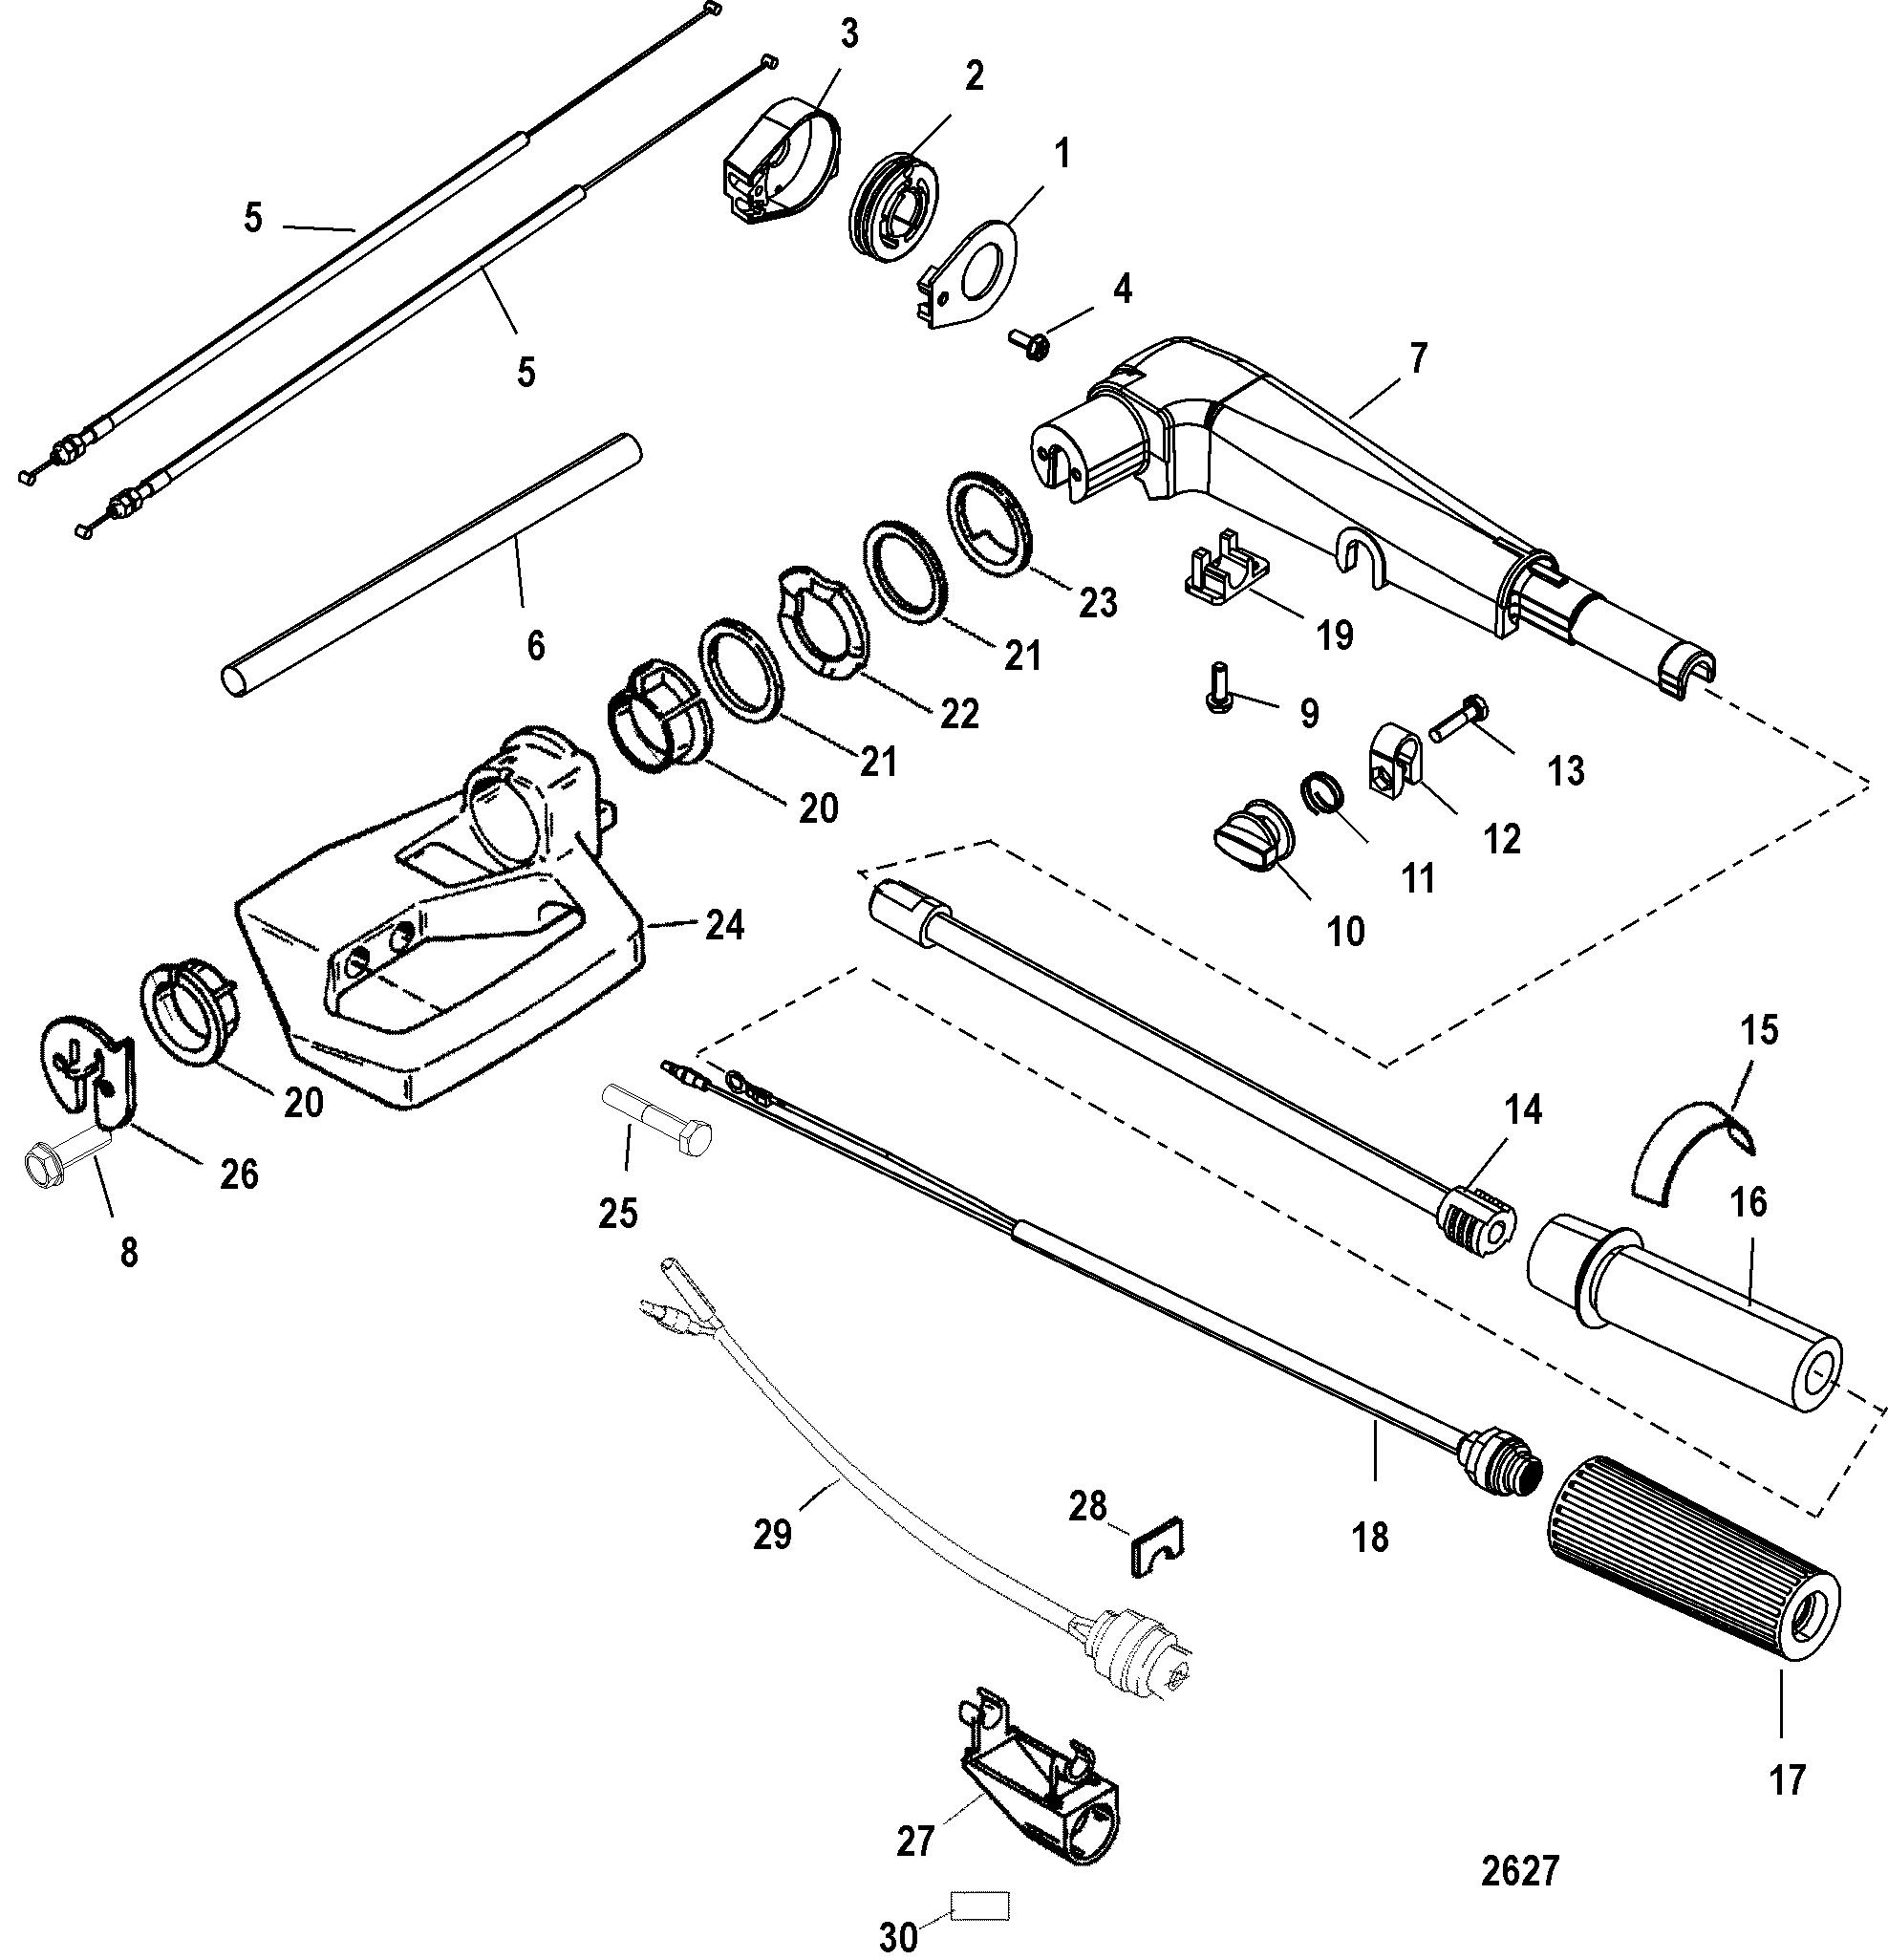 Tiller Handle For Mariner Mercury 9 9 13 5 15 4 Stroke